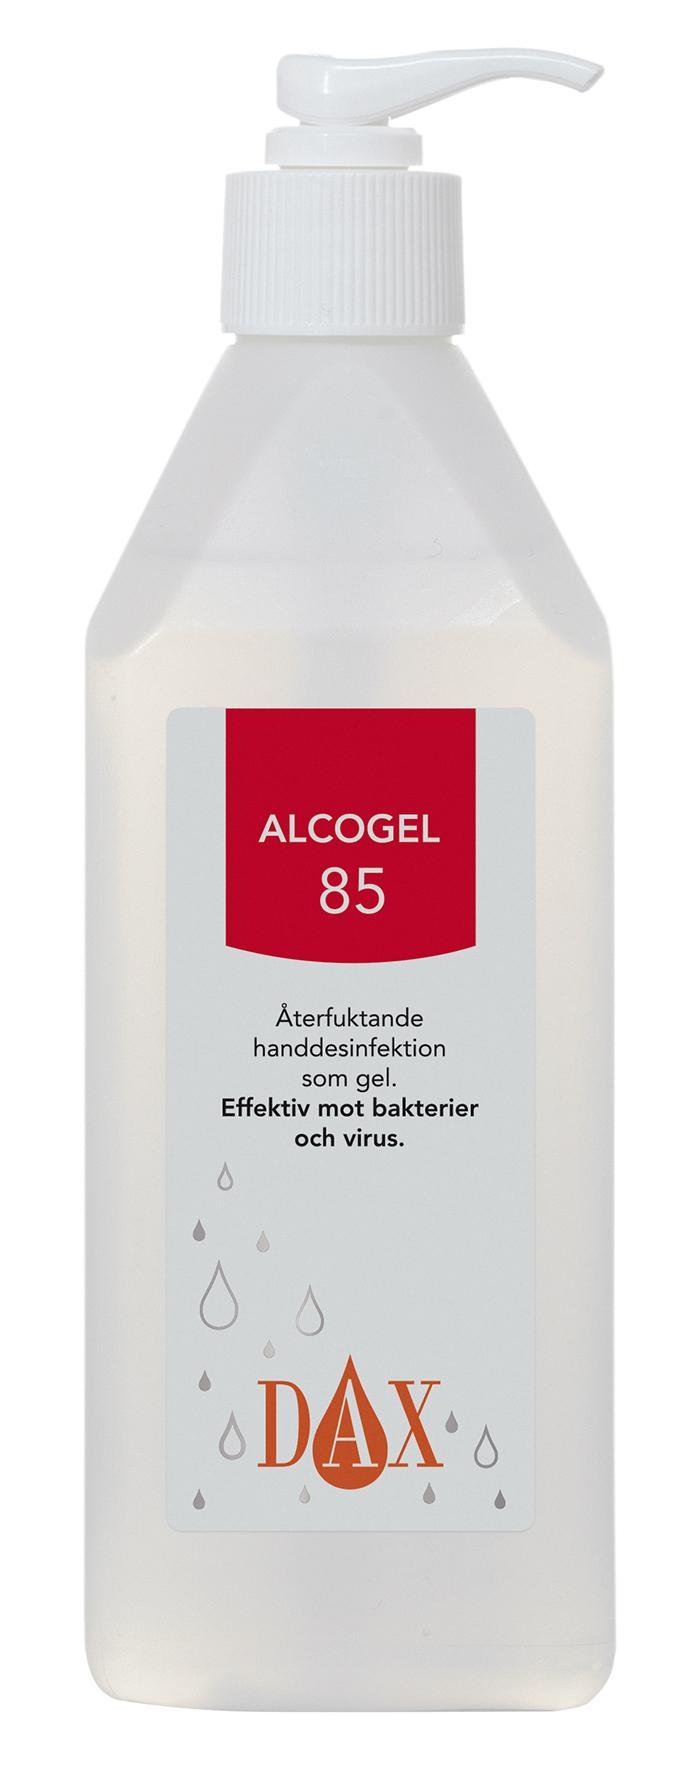 Handdesinfektion DAX Alcogel 85 600ml